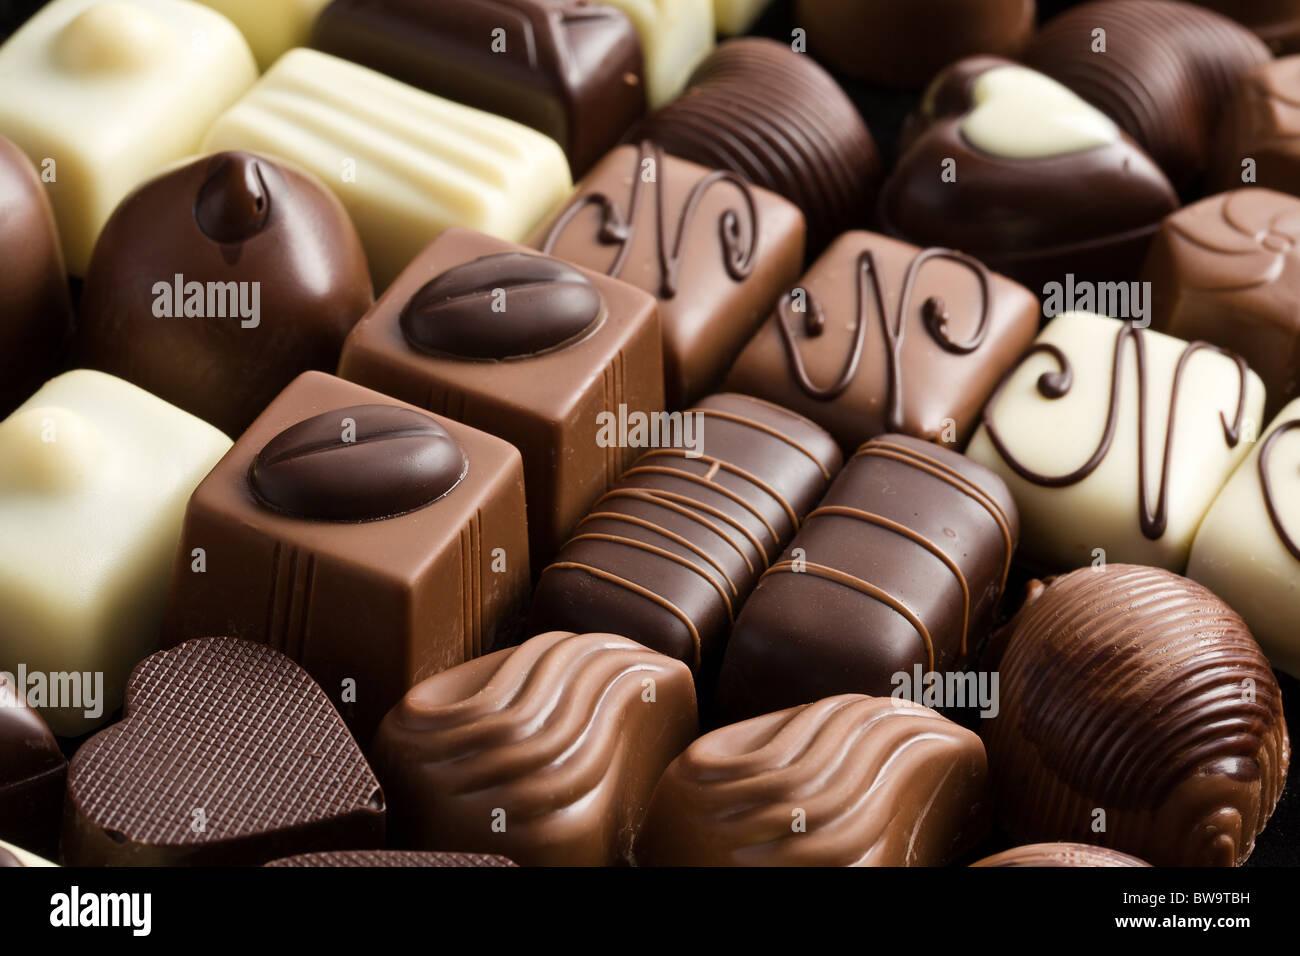 Diversos chocolate praliné Imagen De Stock